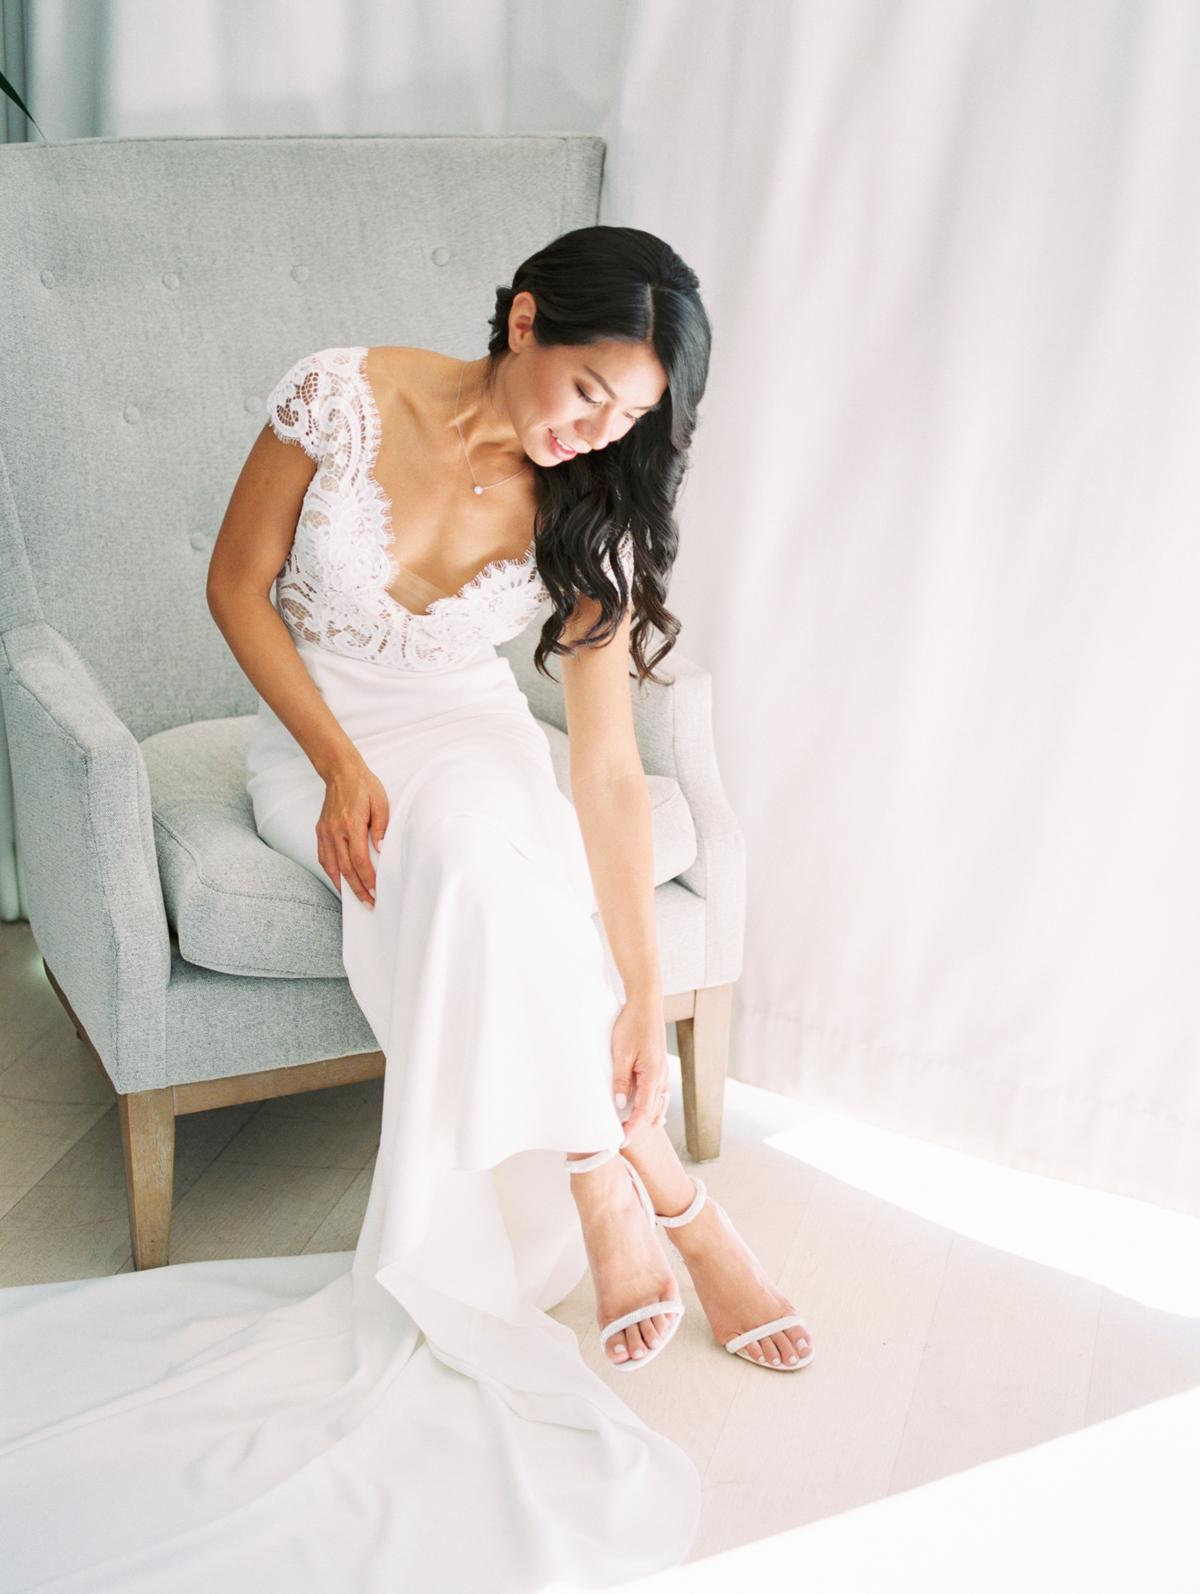 bettina gino bride sitting in wedding dress